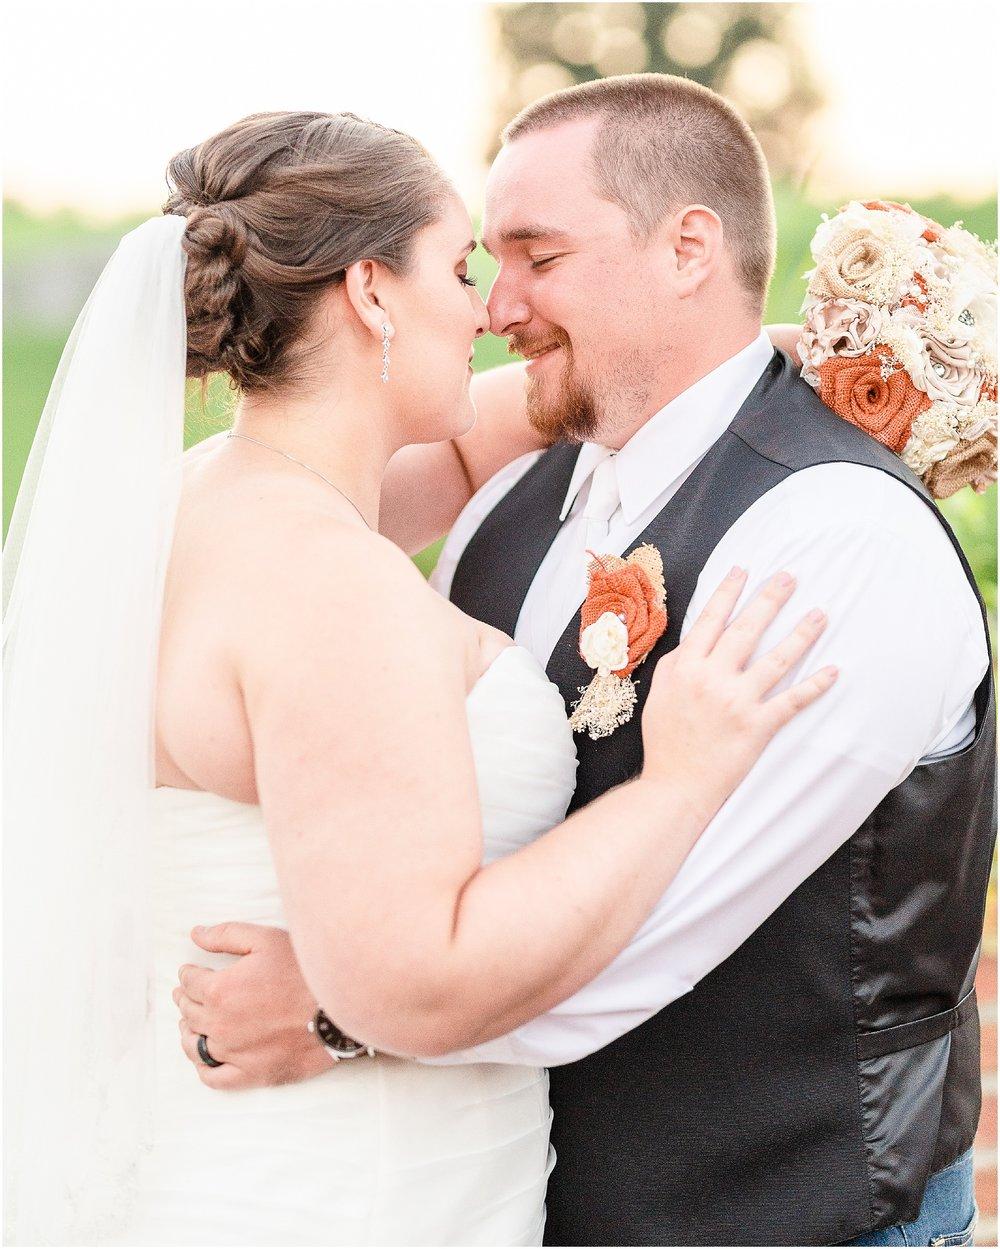 Morningside-inn-wedding-photos_0220.jpg